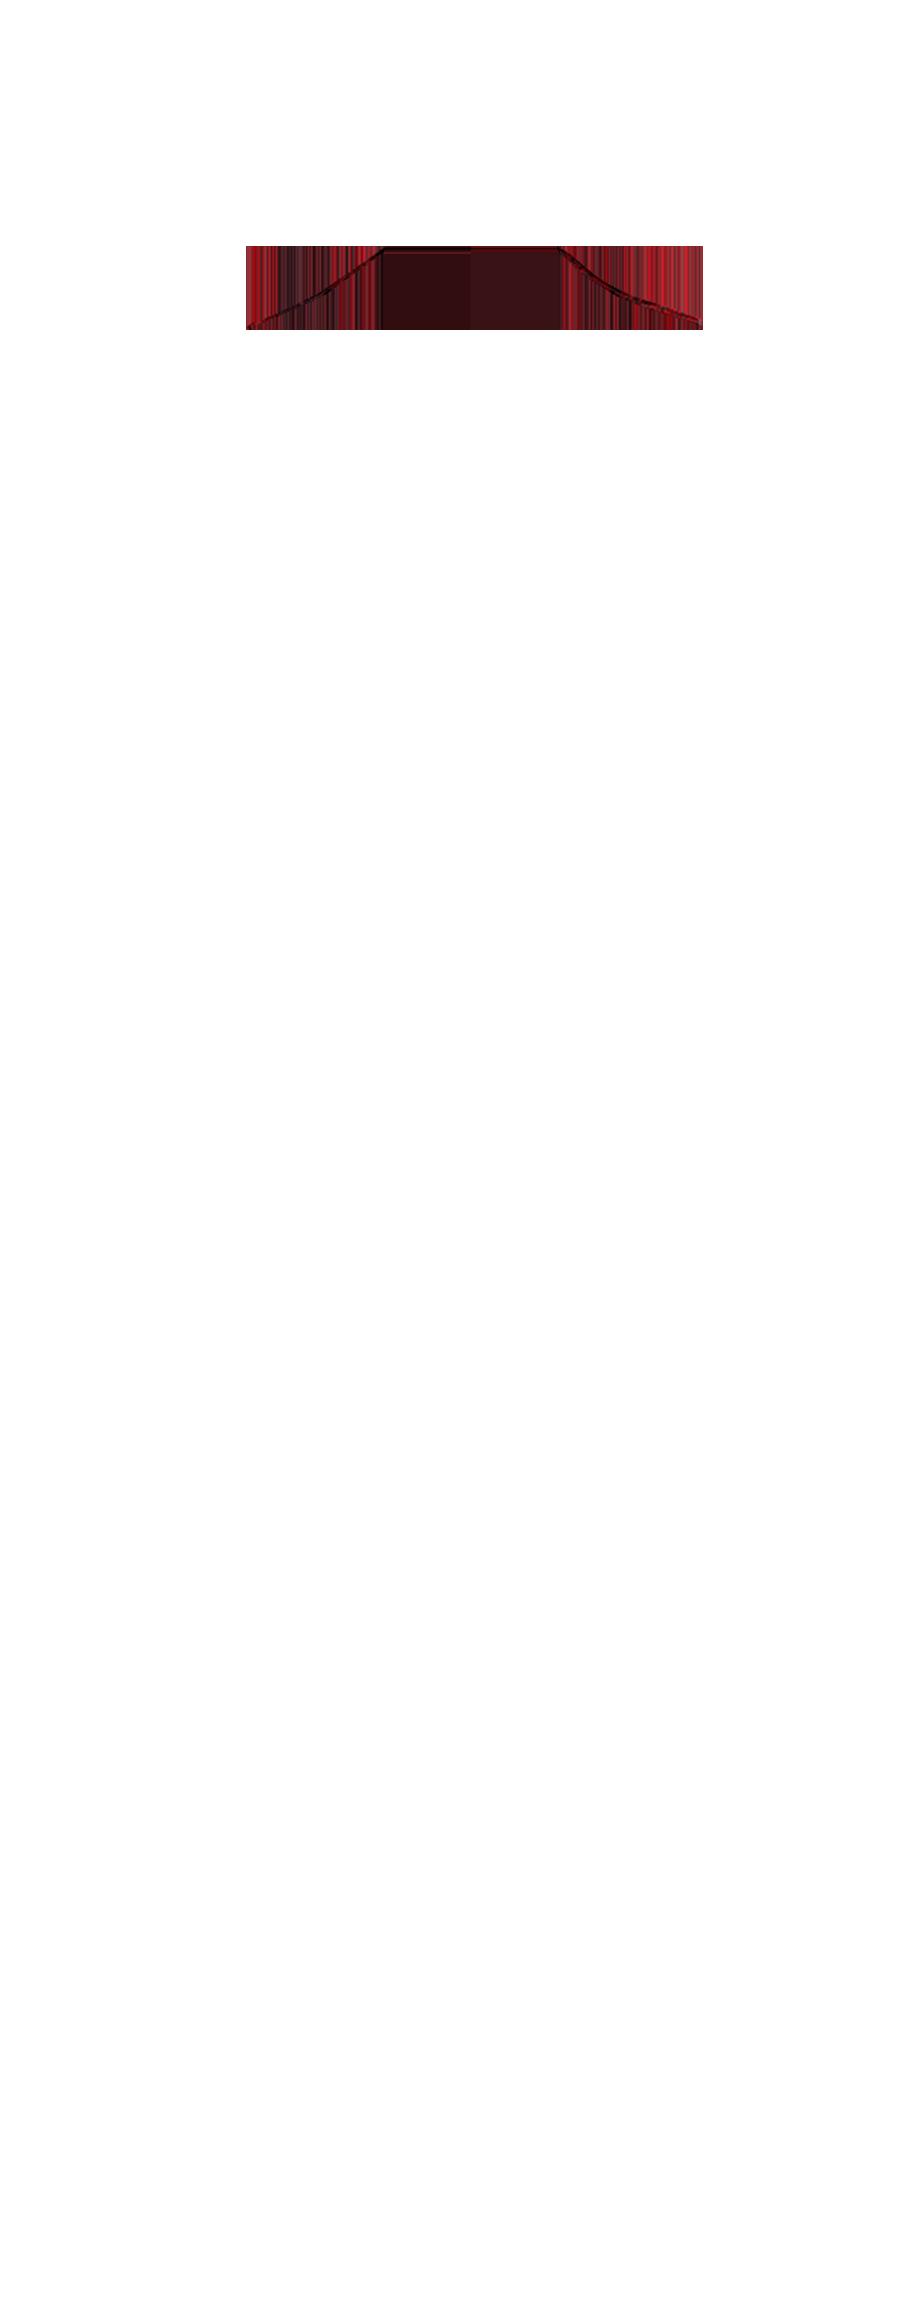 NEFL-22